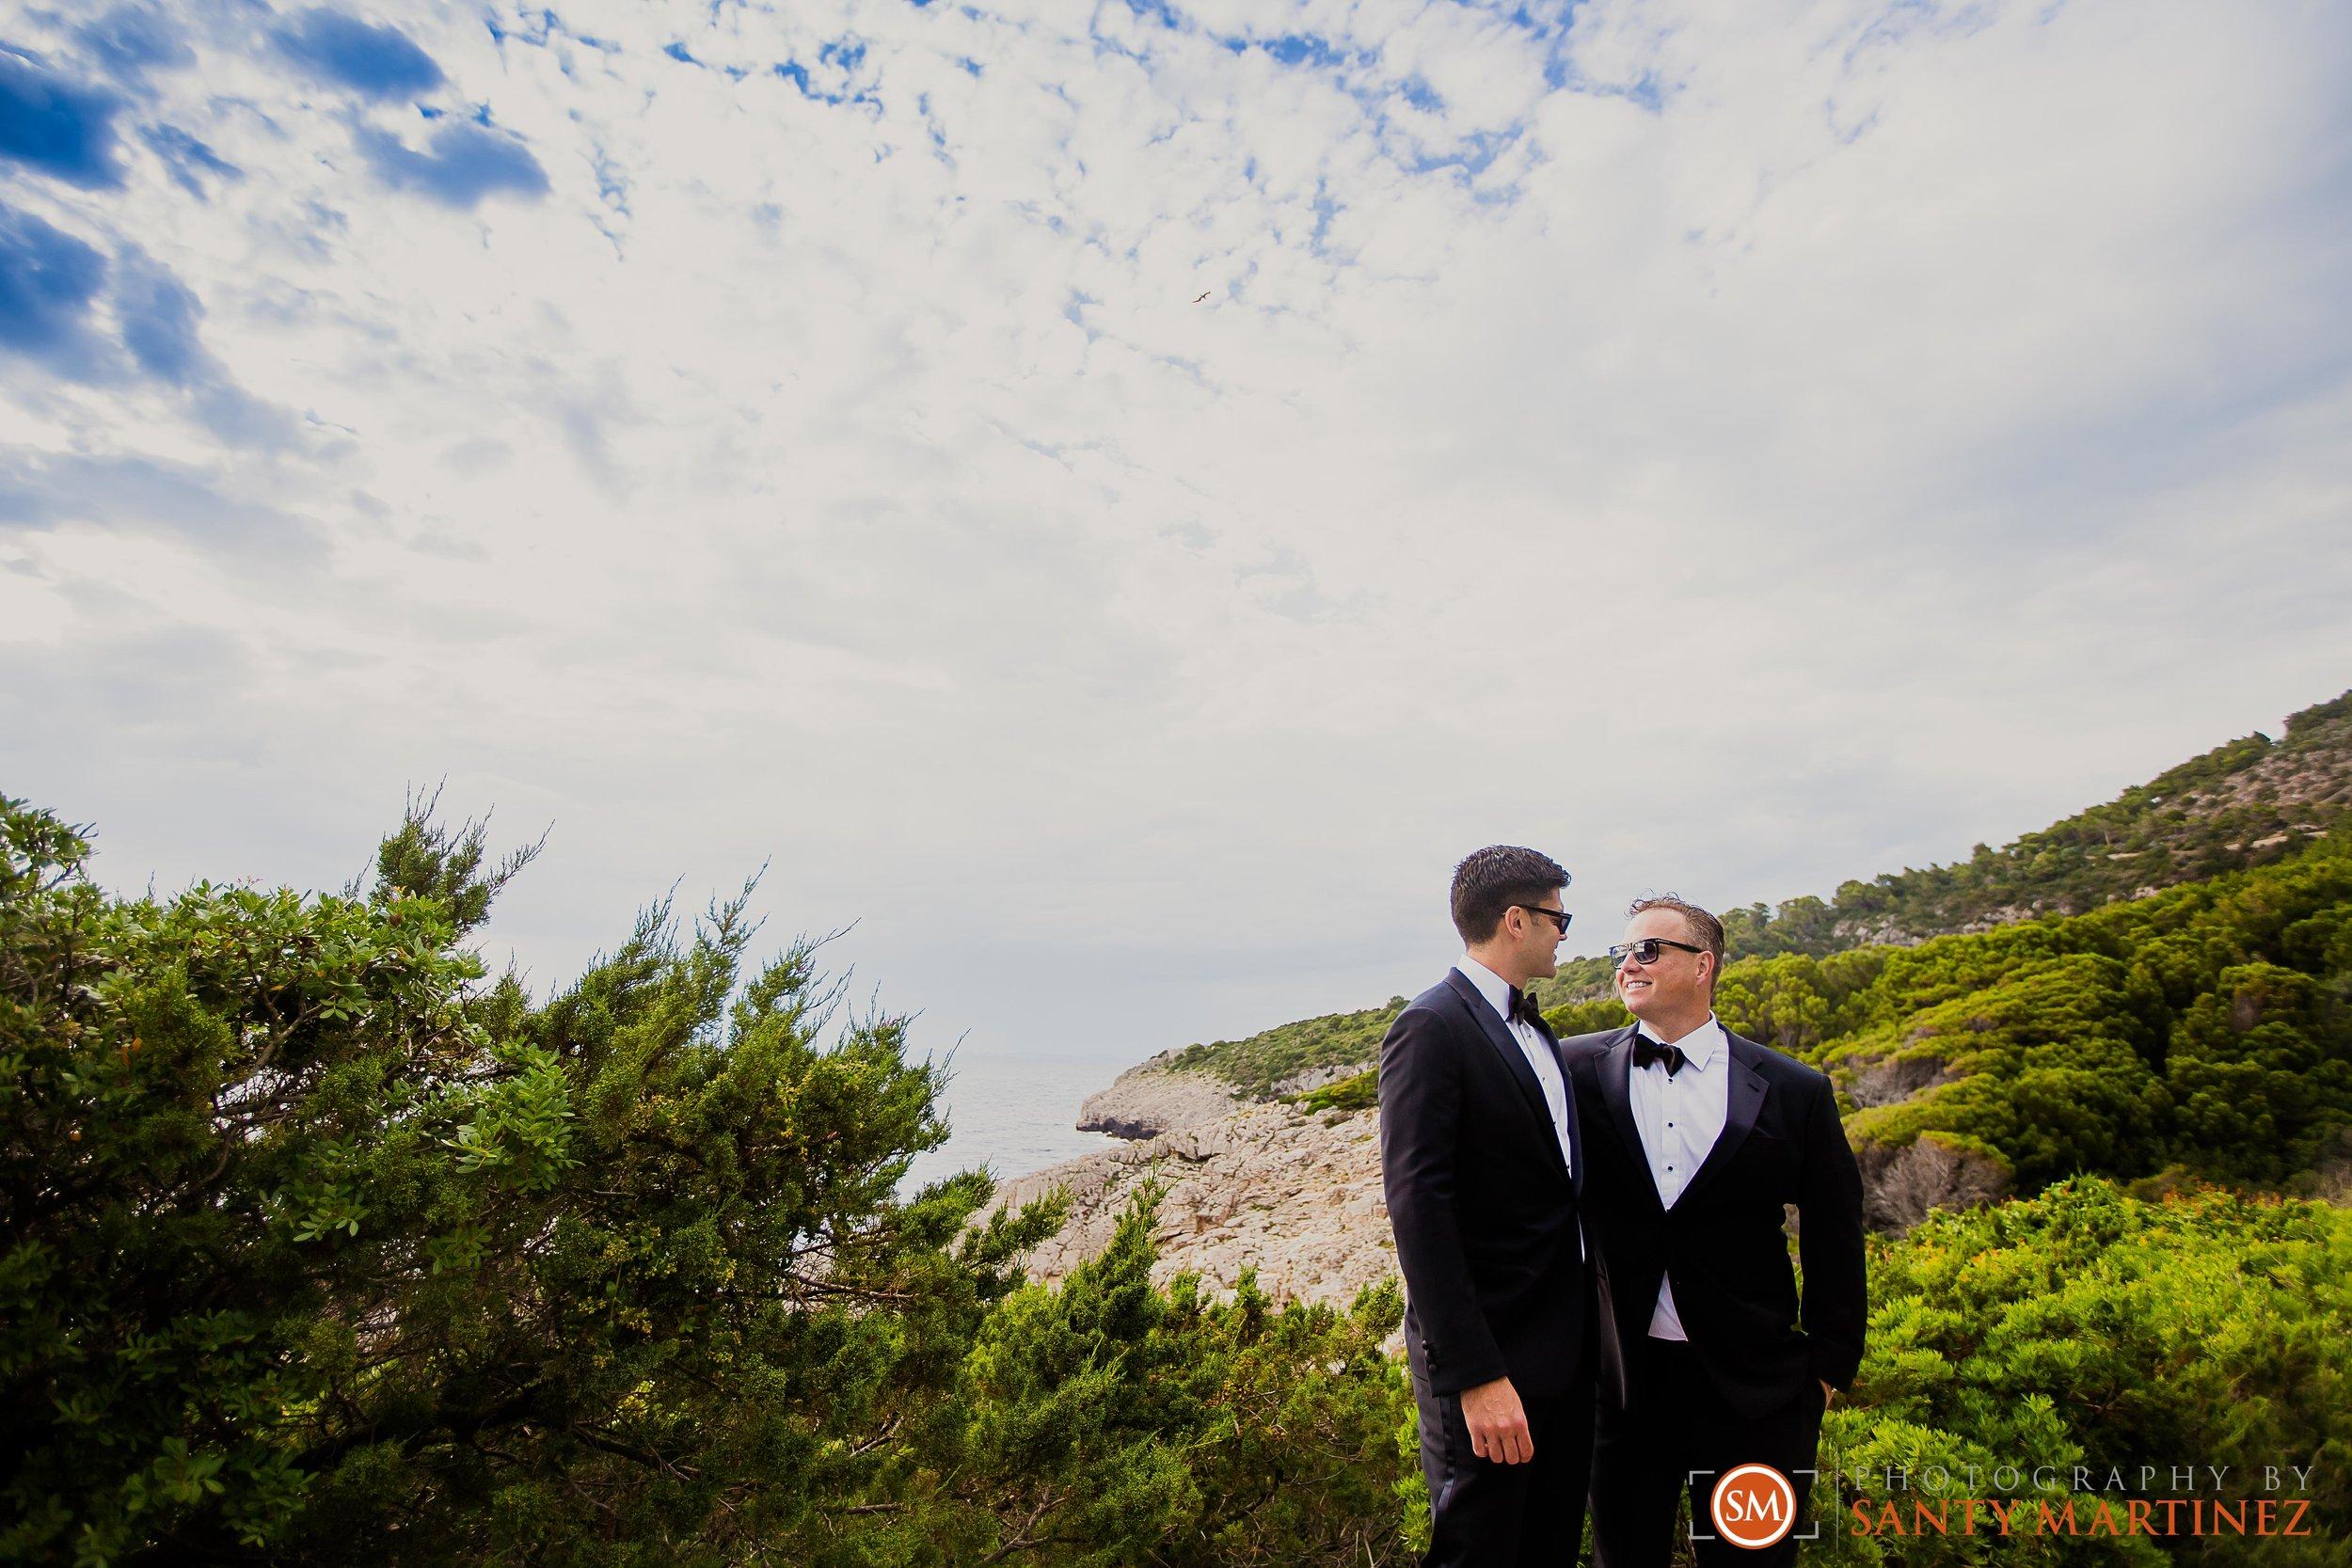 Wedding Capri Italy - Photography by Santy Martinez-31.jpg